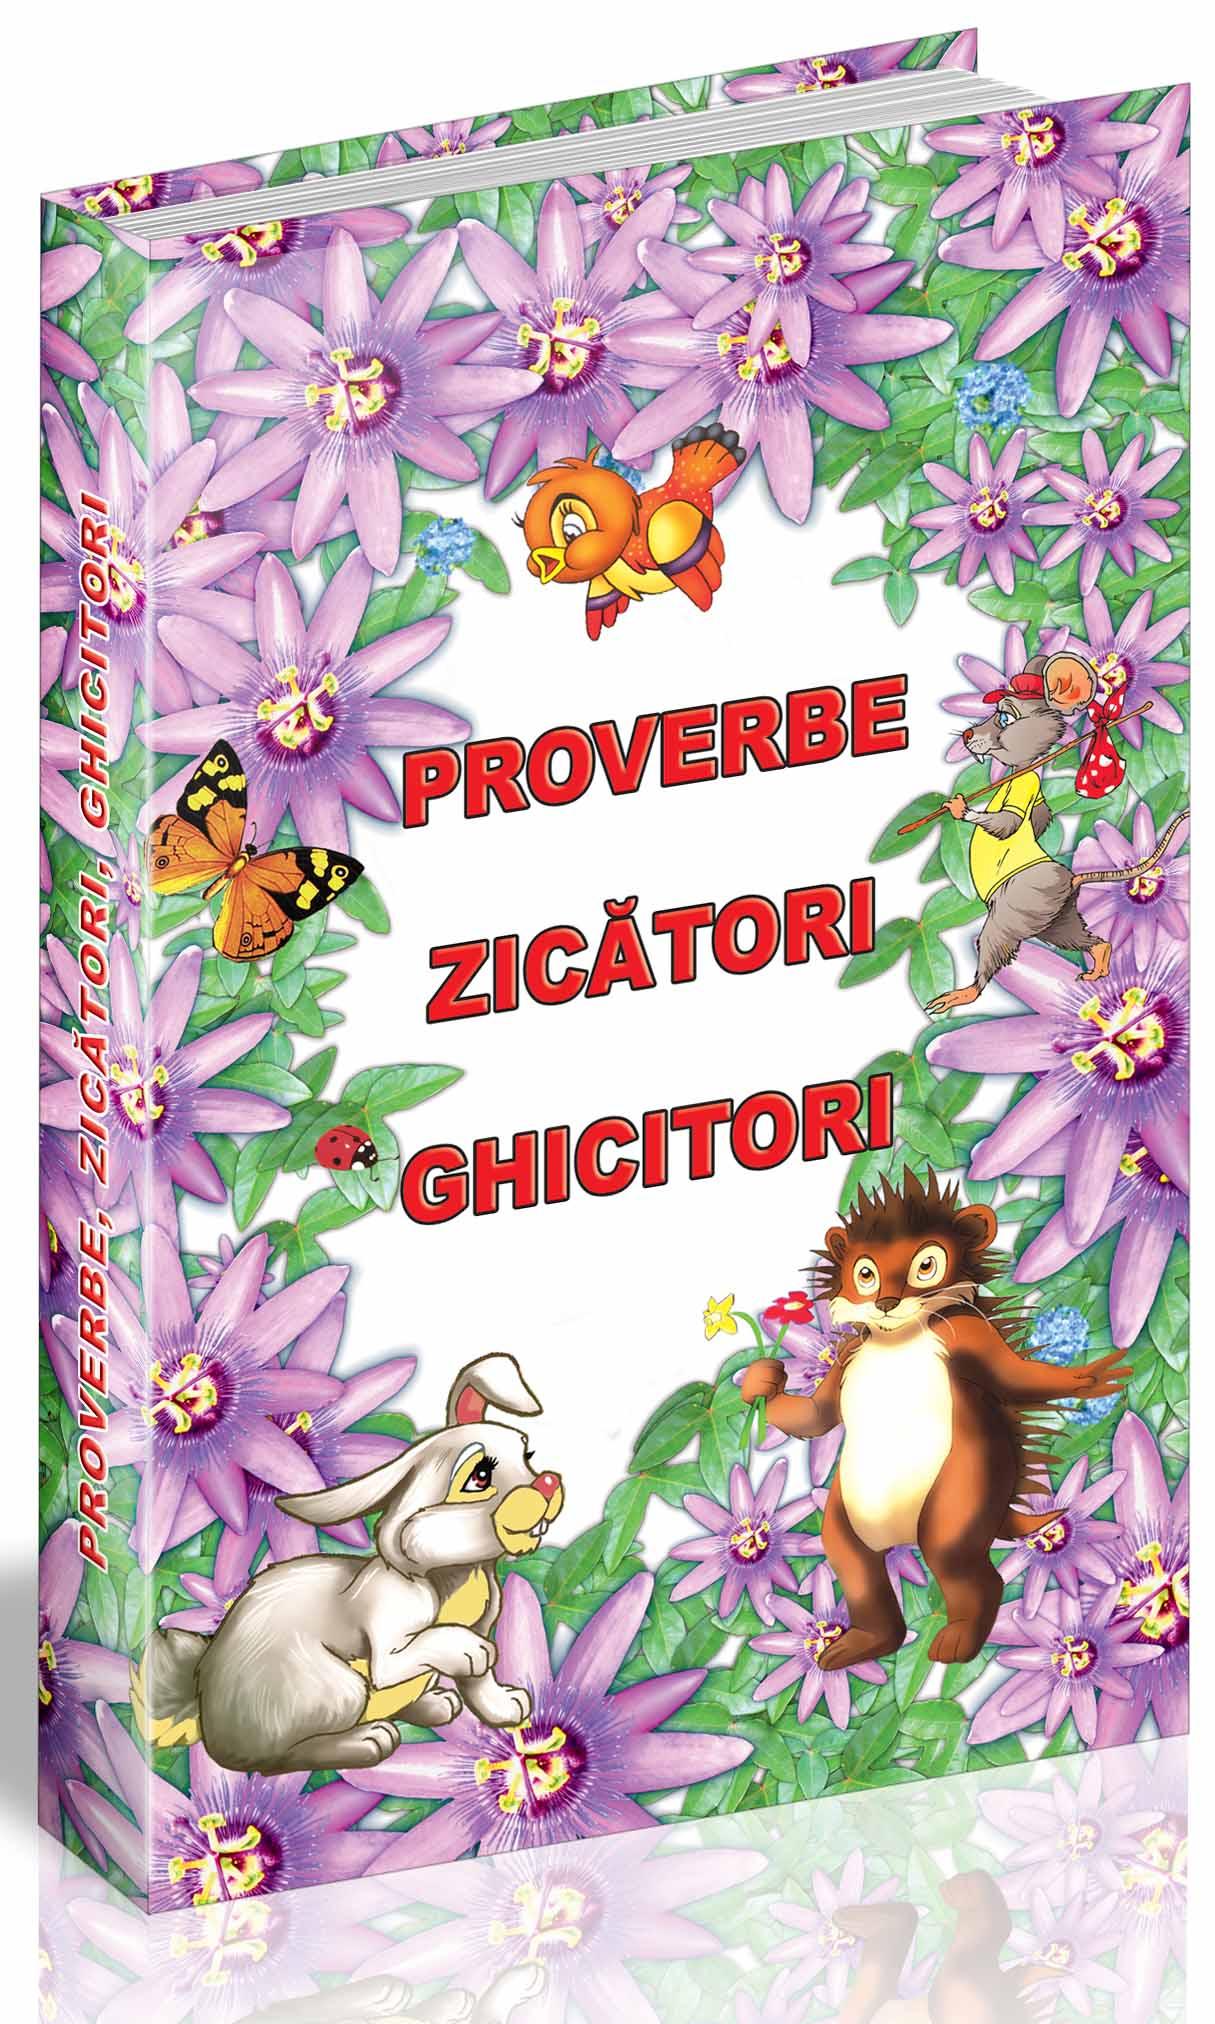 Proverbe și zicători pentru micii scriitori